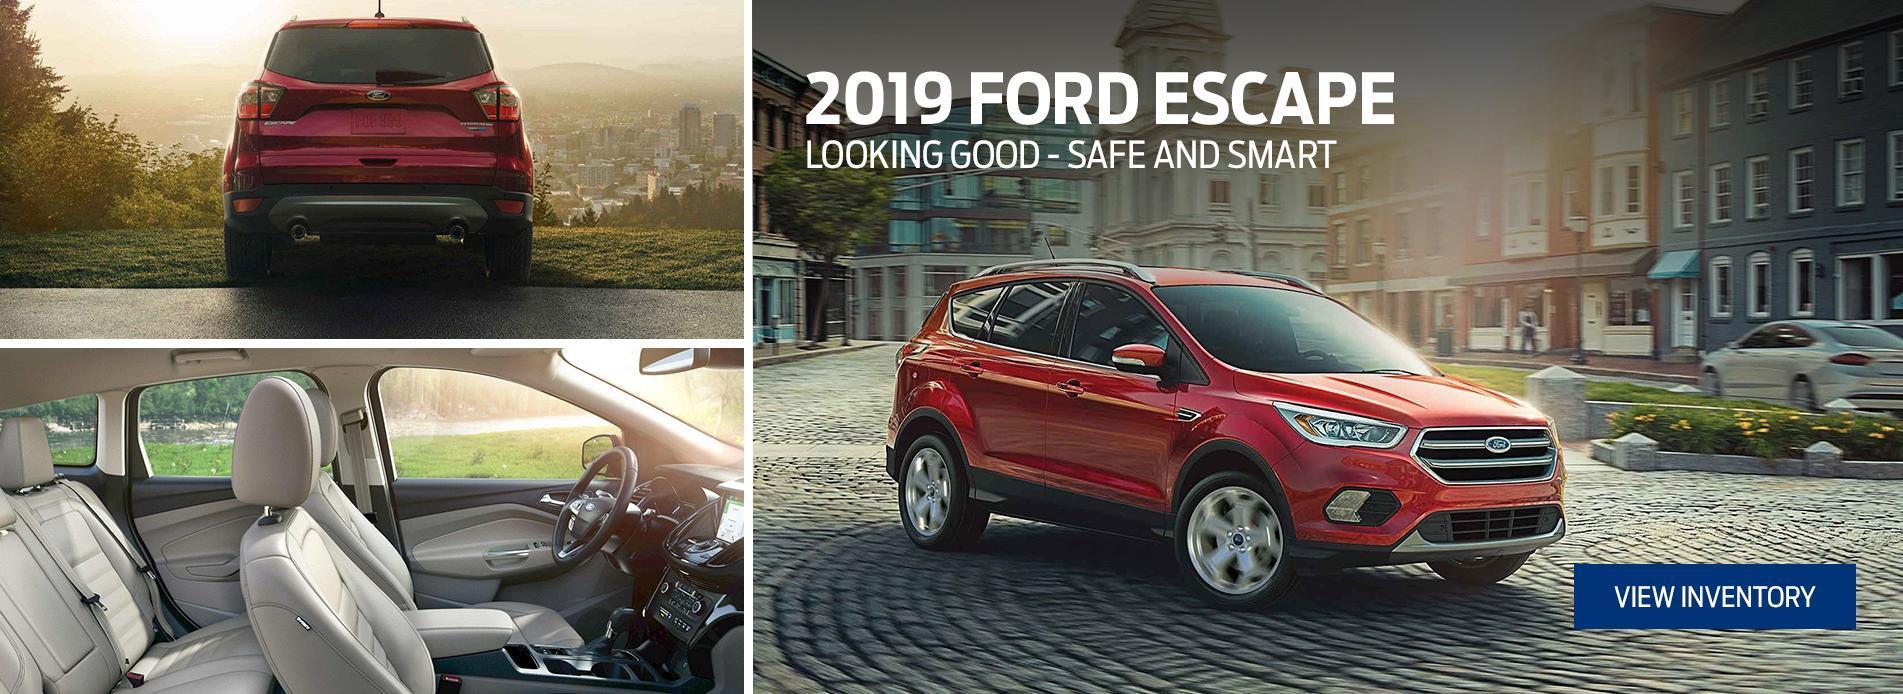 2019 Ford Escape Clarenville Ford